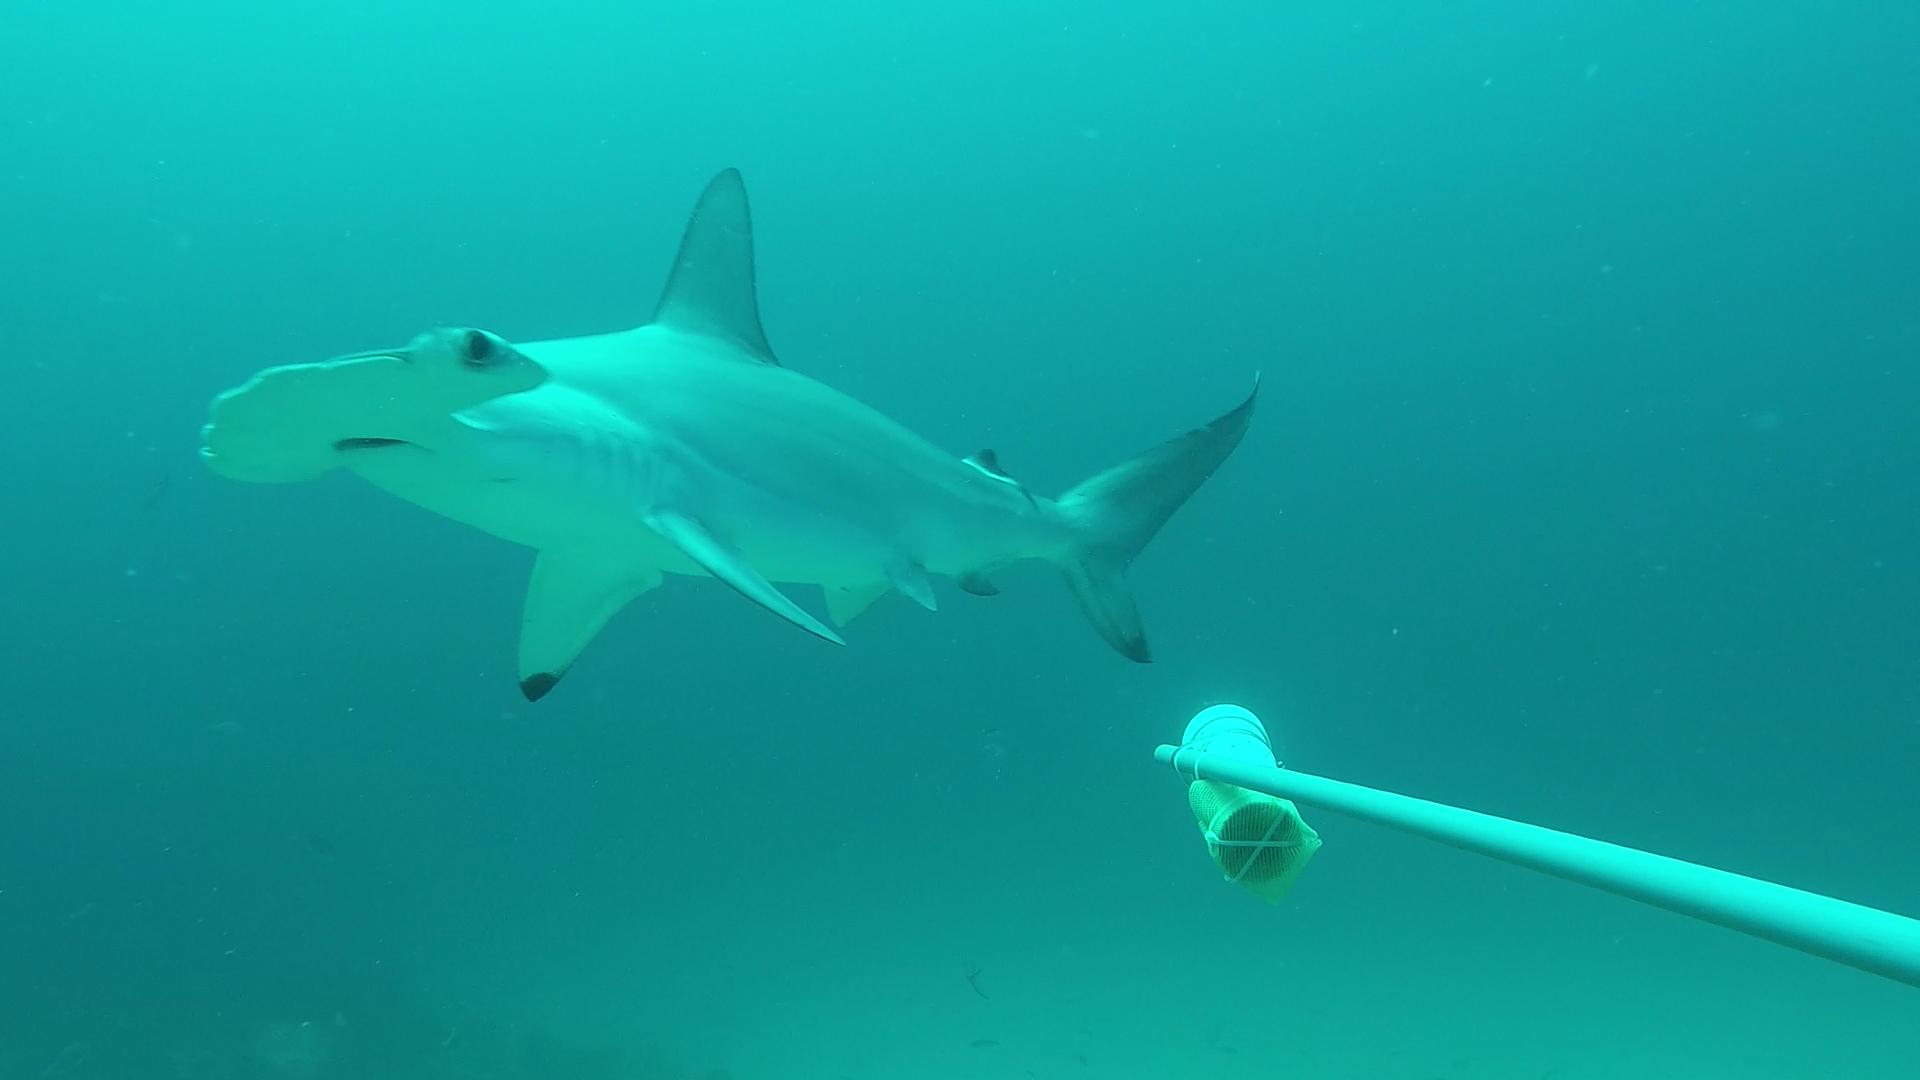 MARREROdavid - Galapagos underwater